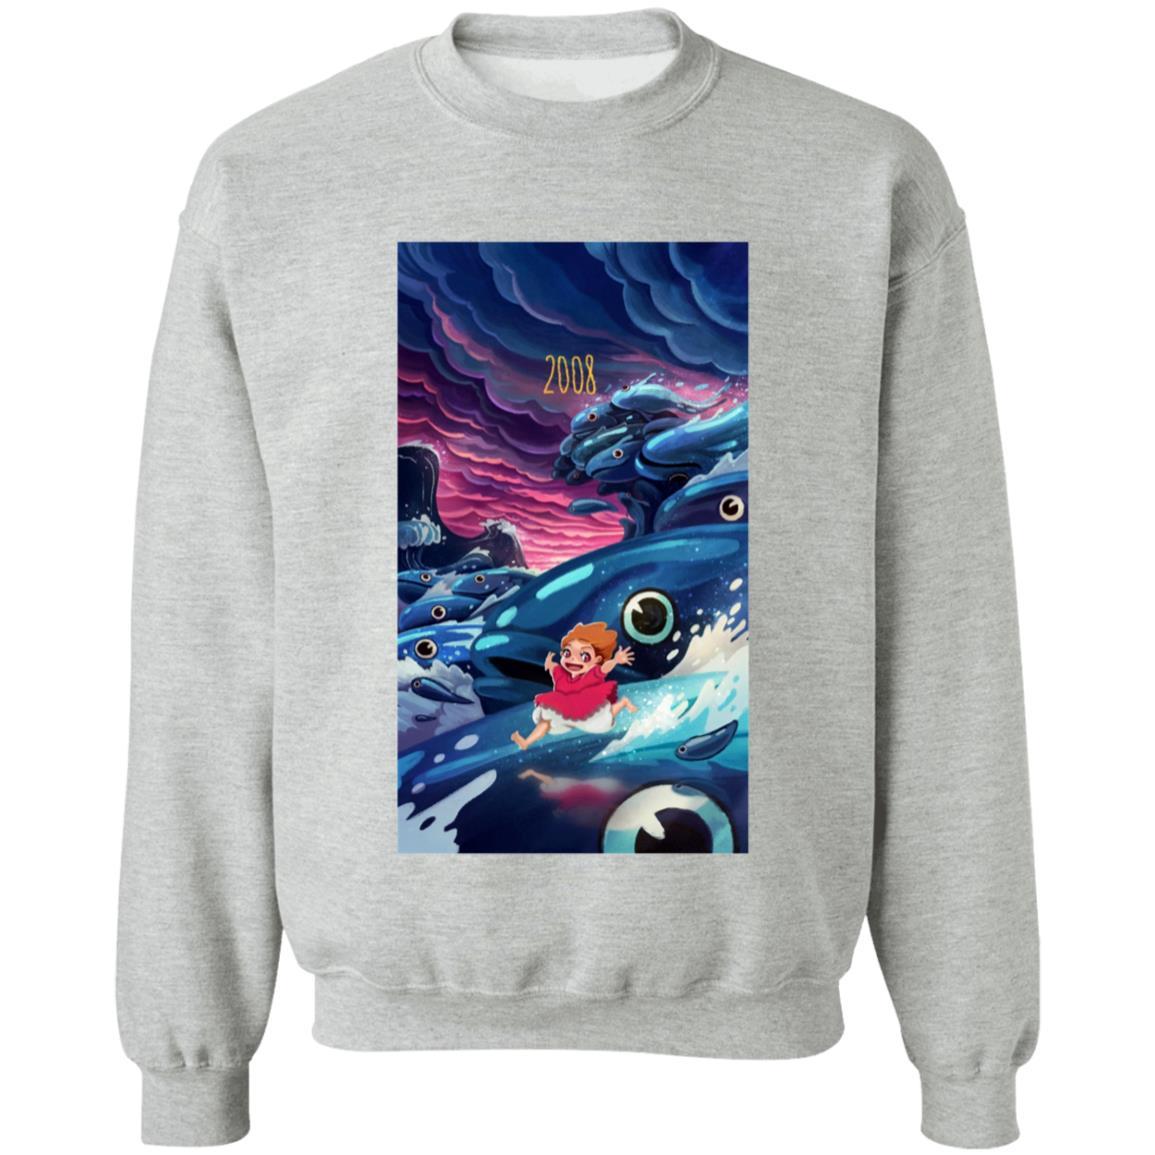 Ponyo 2008 Illustration Sweatshirt